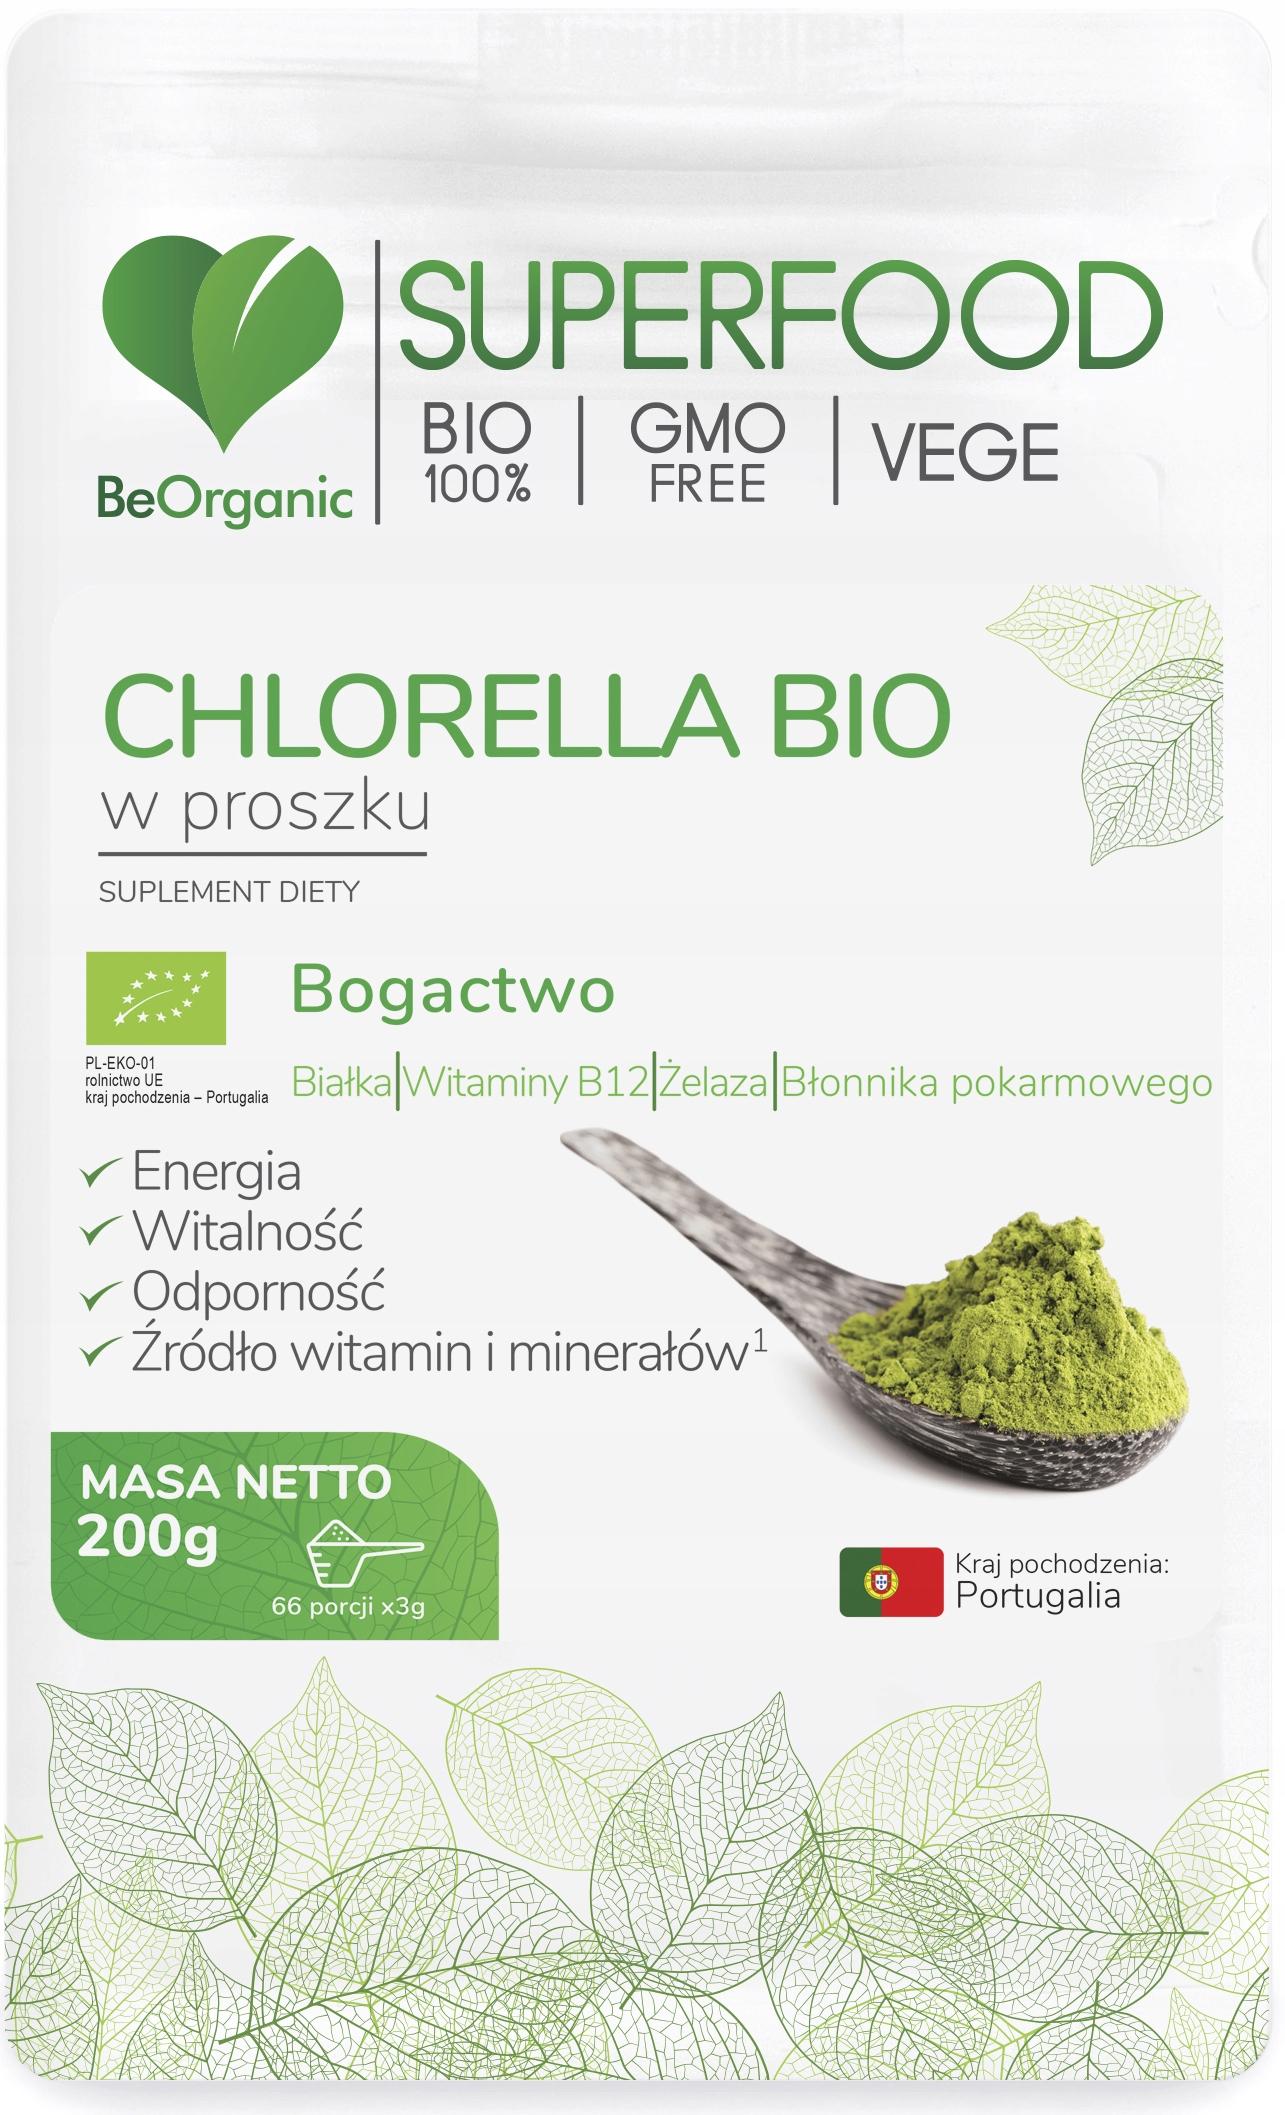 BeOrganic CHLORELLA Bio ORGANICZNA w proszku 200g